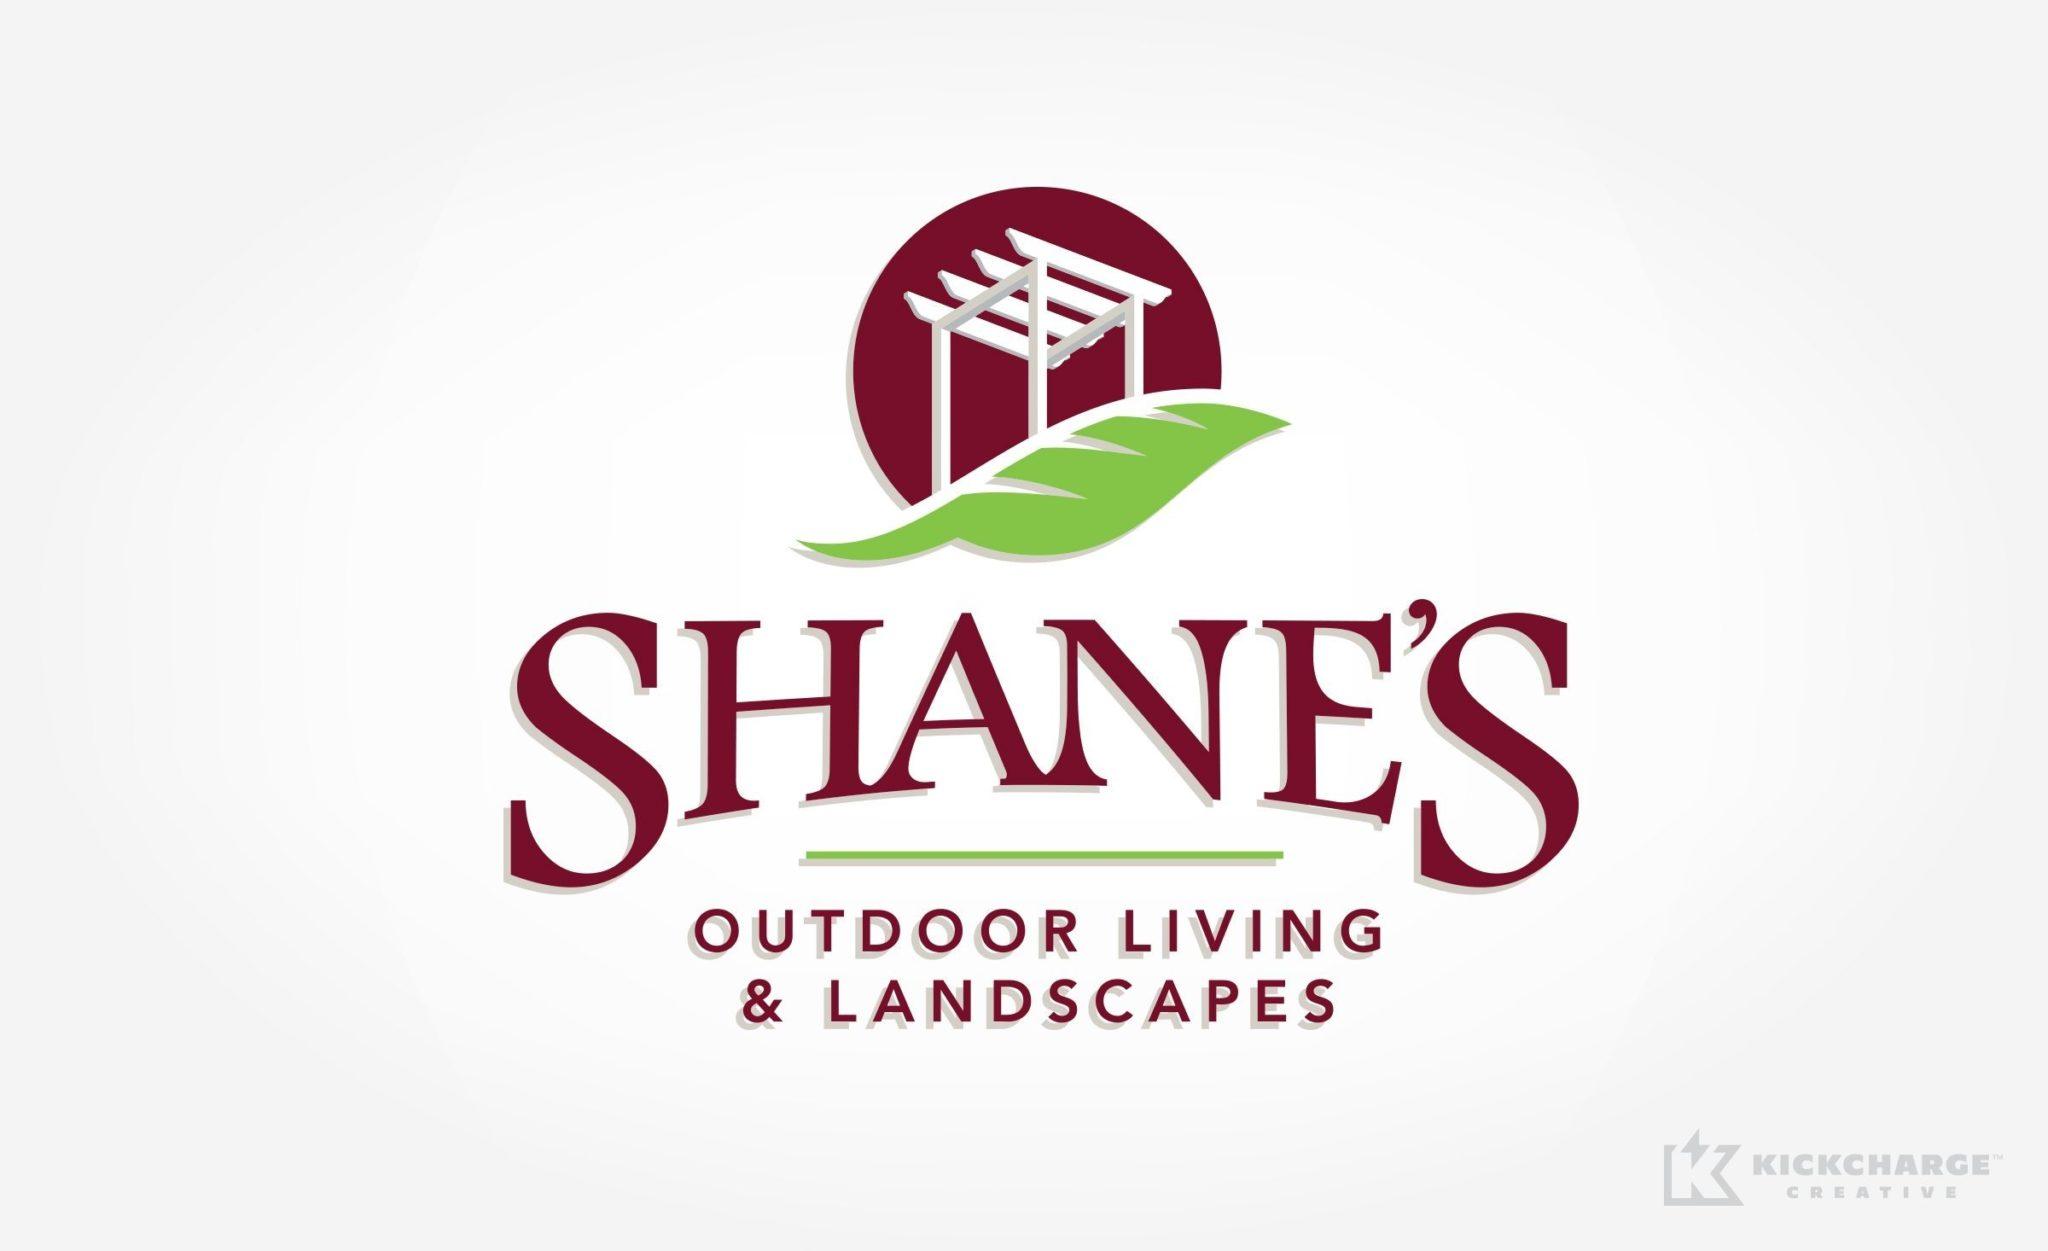 Shane's Outdoor Living & Landscapes - KickCharge Creative ... on Outdoor Living And Landscapes id=76738